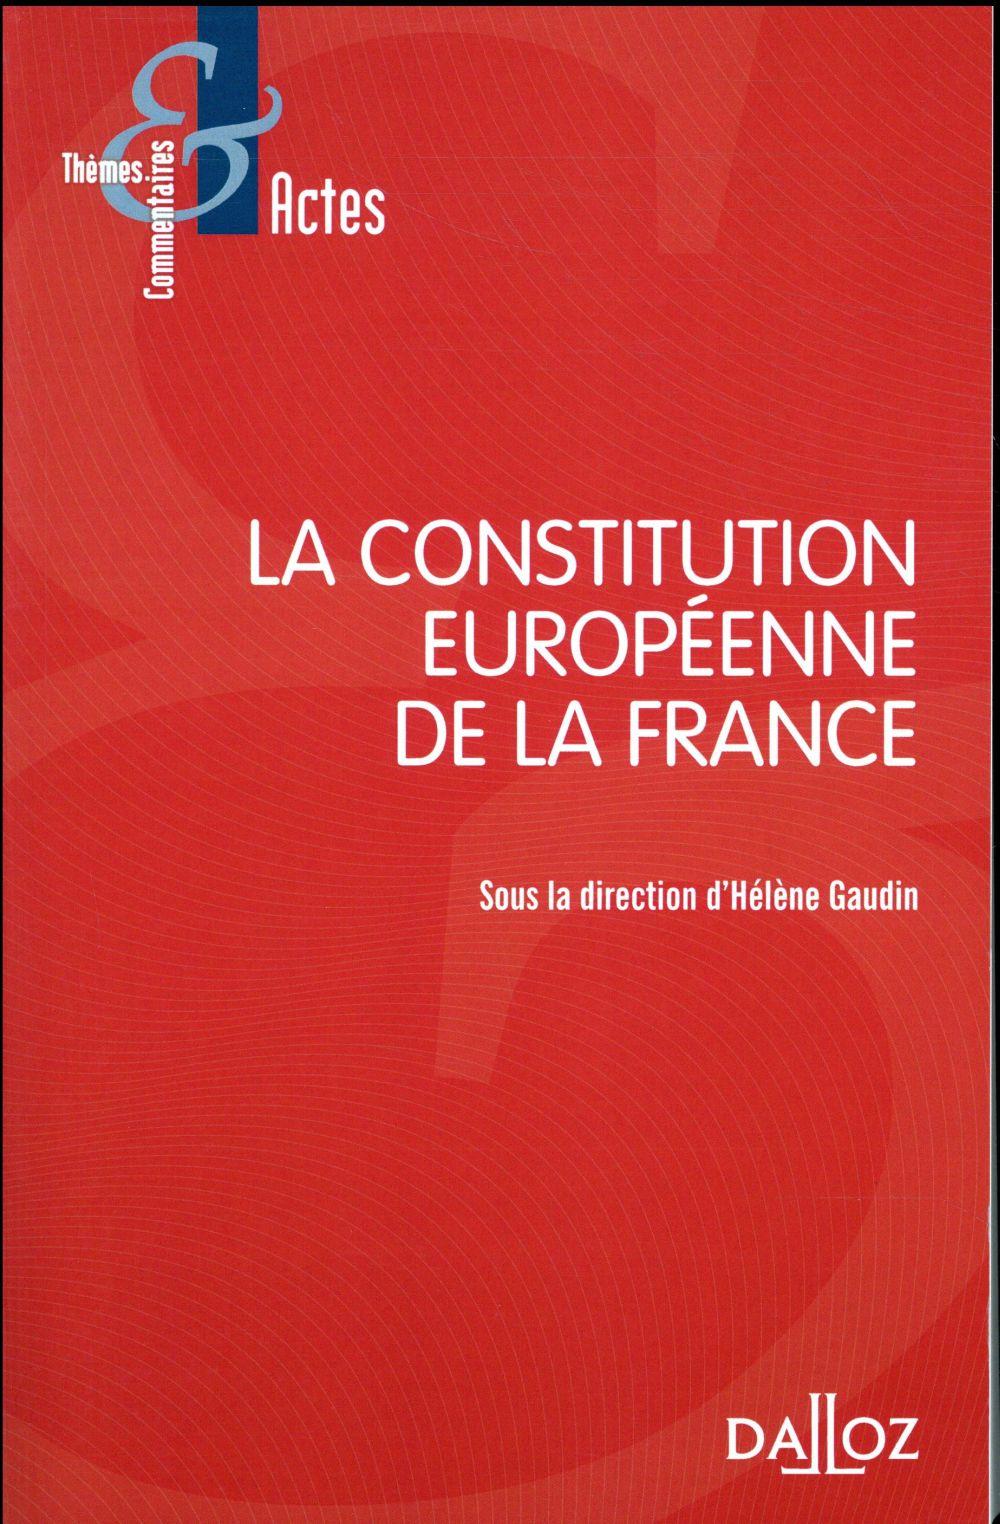 LA CONSTITUTION EUROPEENNE DE LA FRANCE